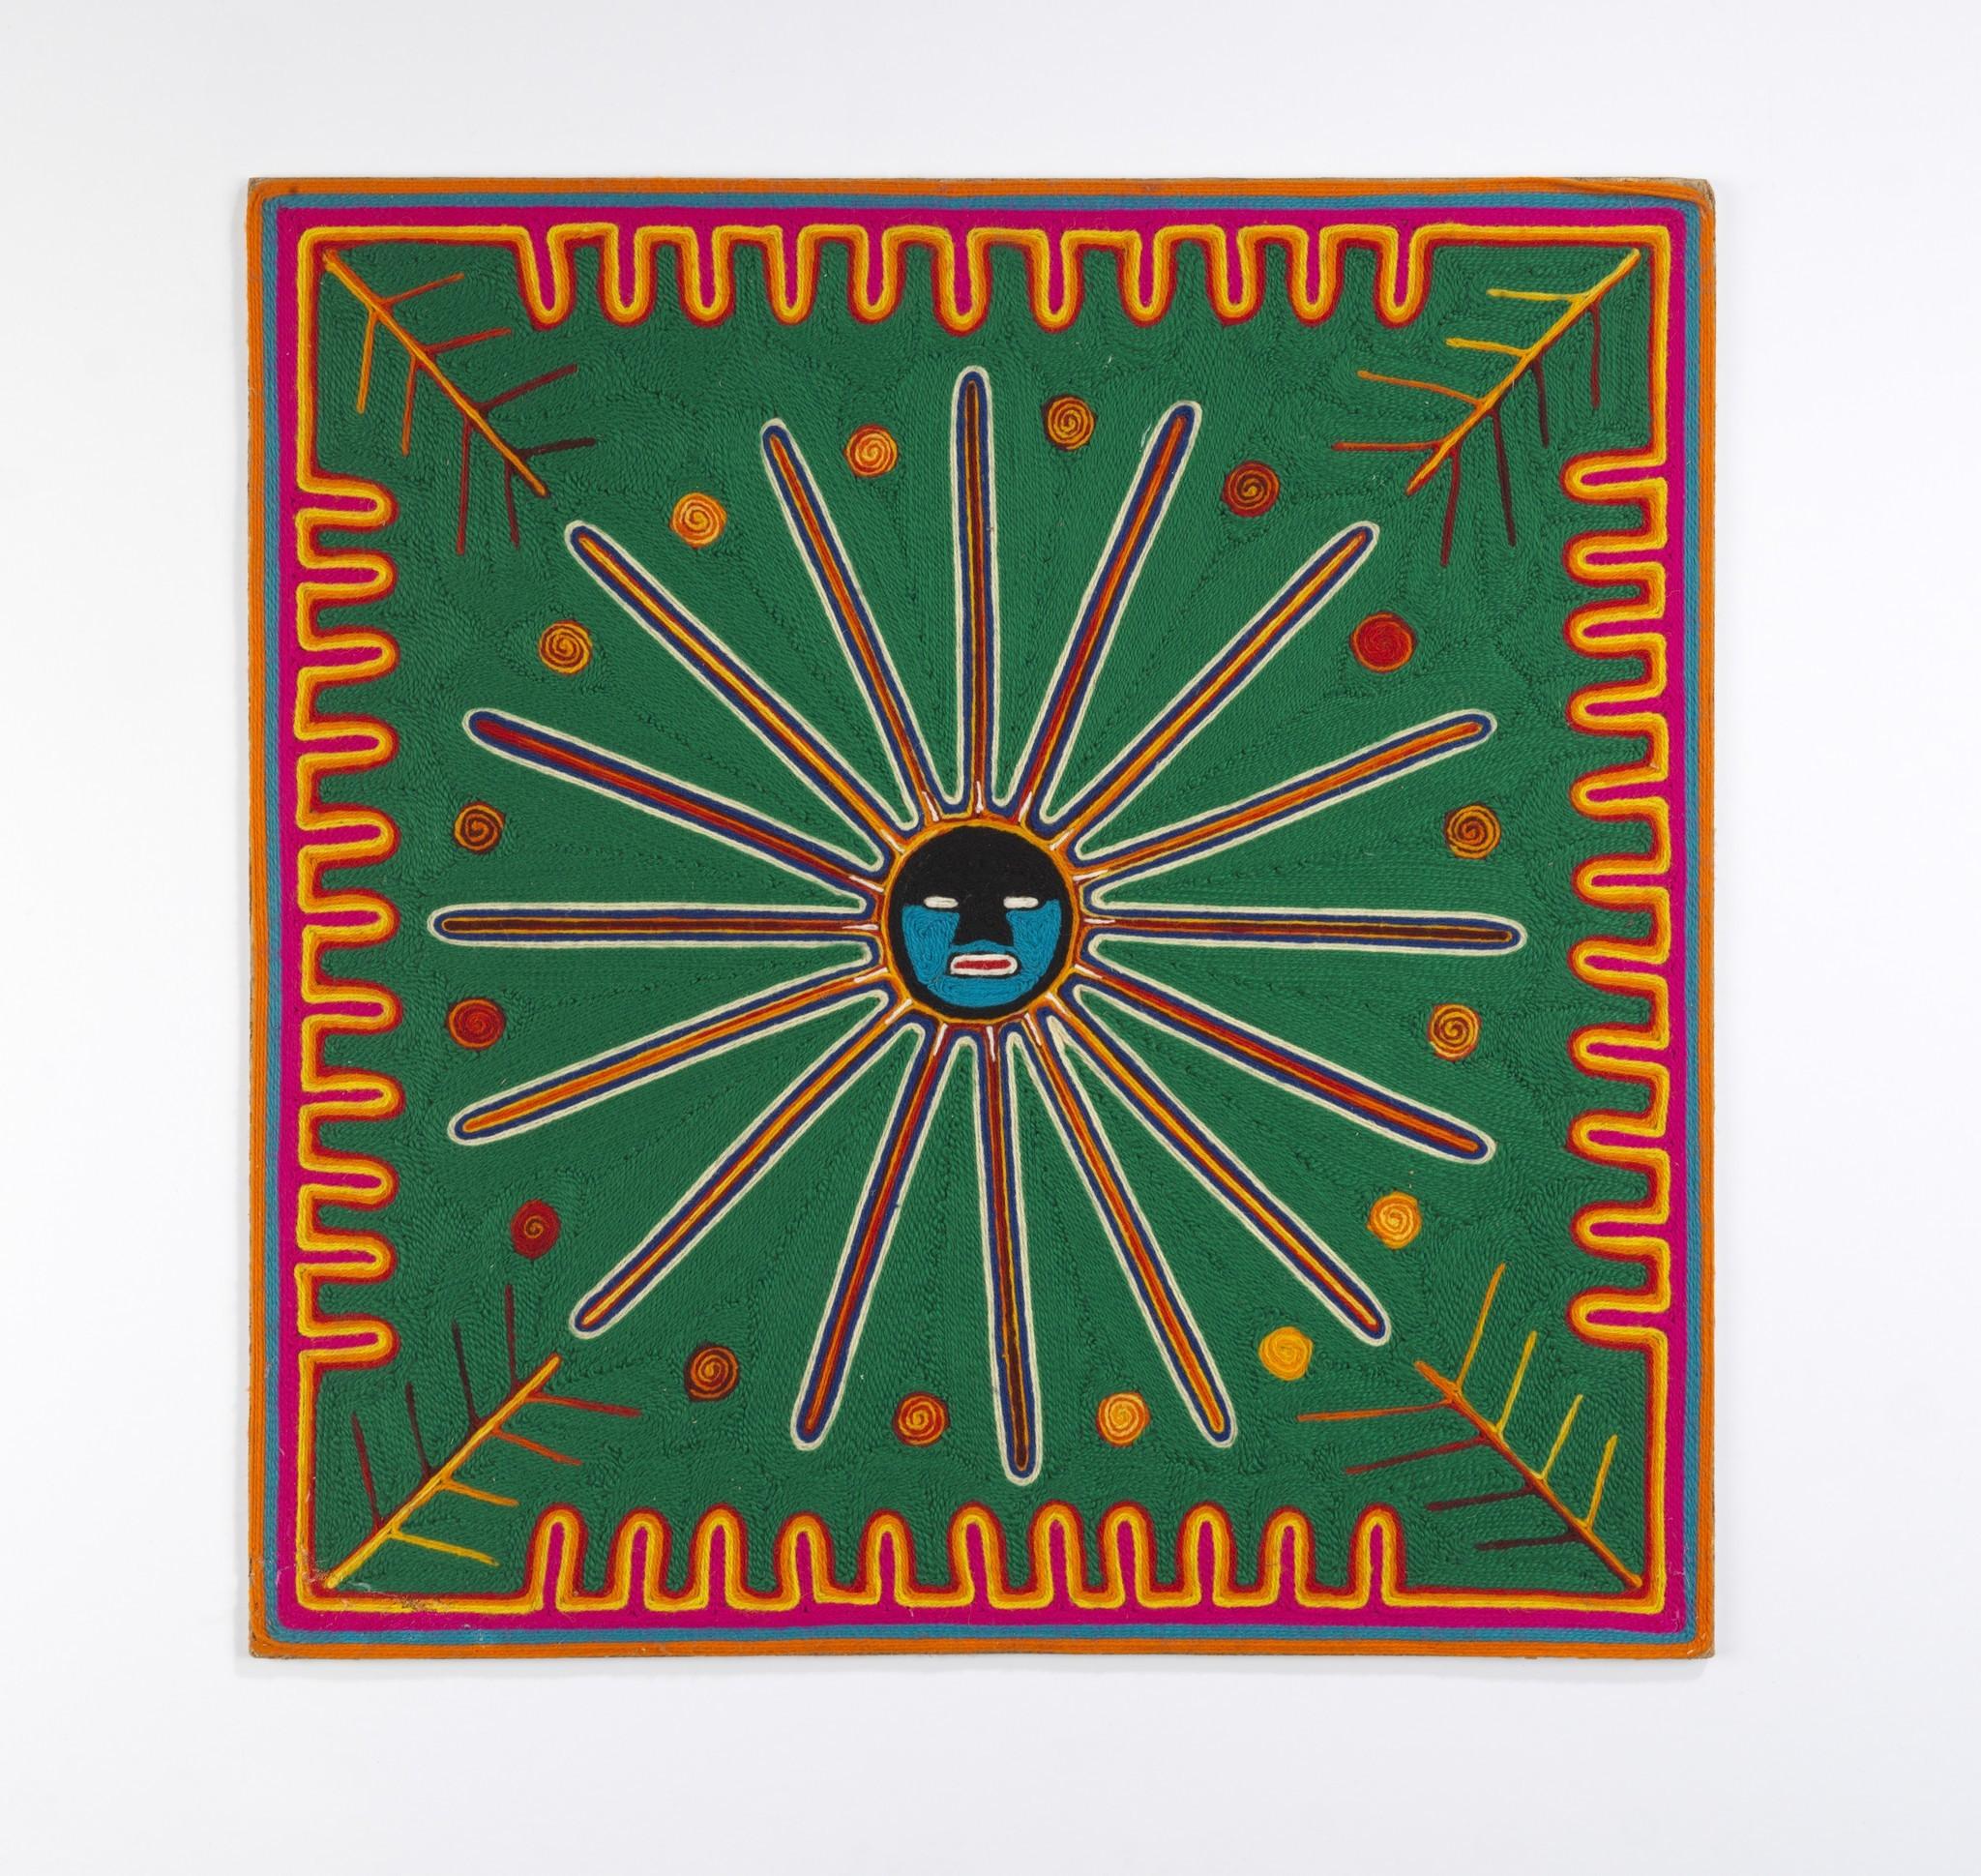 Untitled work by Ramon Medina Silva, mid-1960s. Yarn, beeswax, composition board.